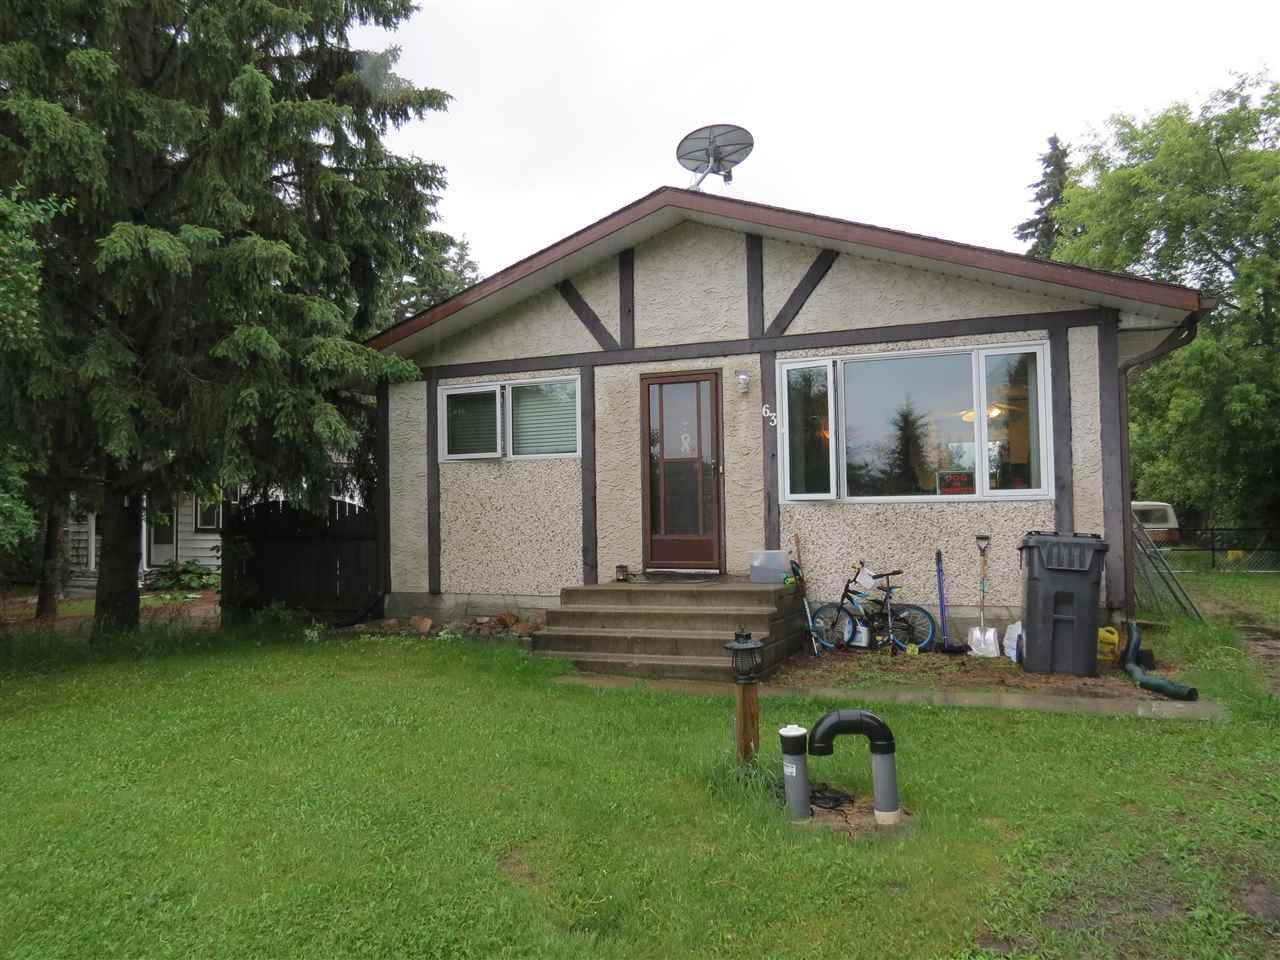 Main Photo: 63 24400 TWP RD 552: Rural Sturgeon County House for sale : MLS®# E4162745